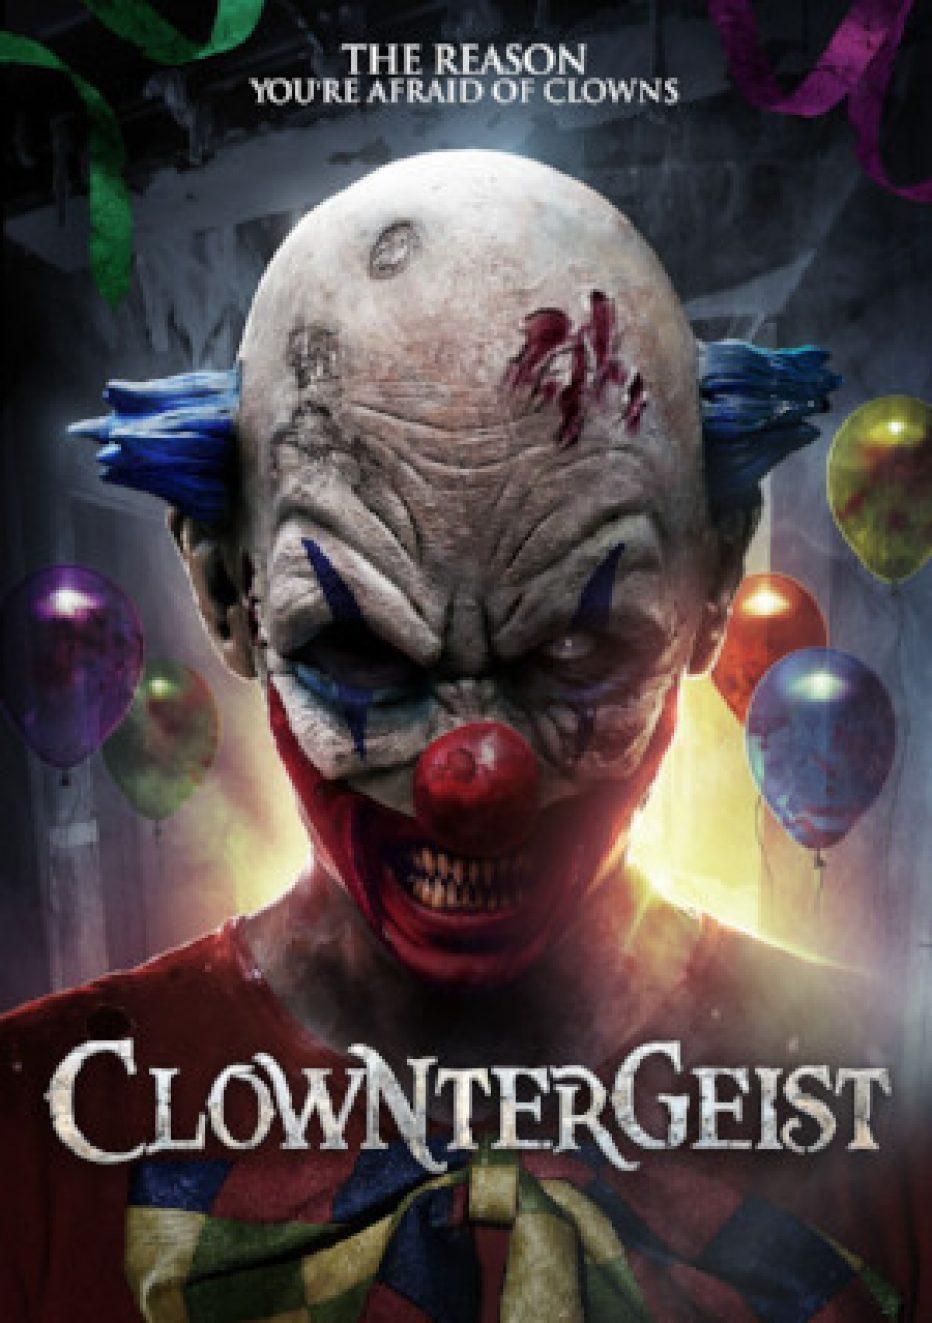 POLTERGEIST meets IT in CLOWNTERGEIST – premiering on VOD this September!